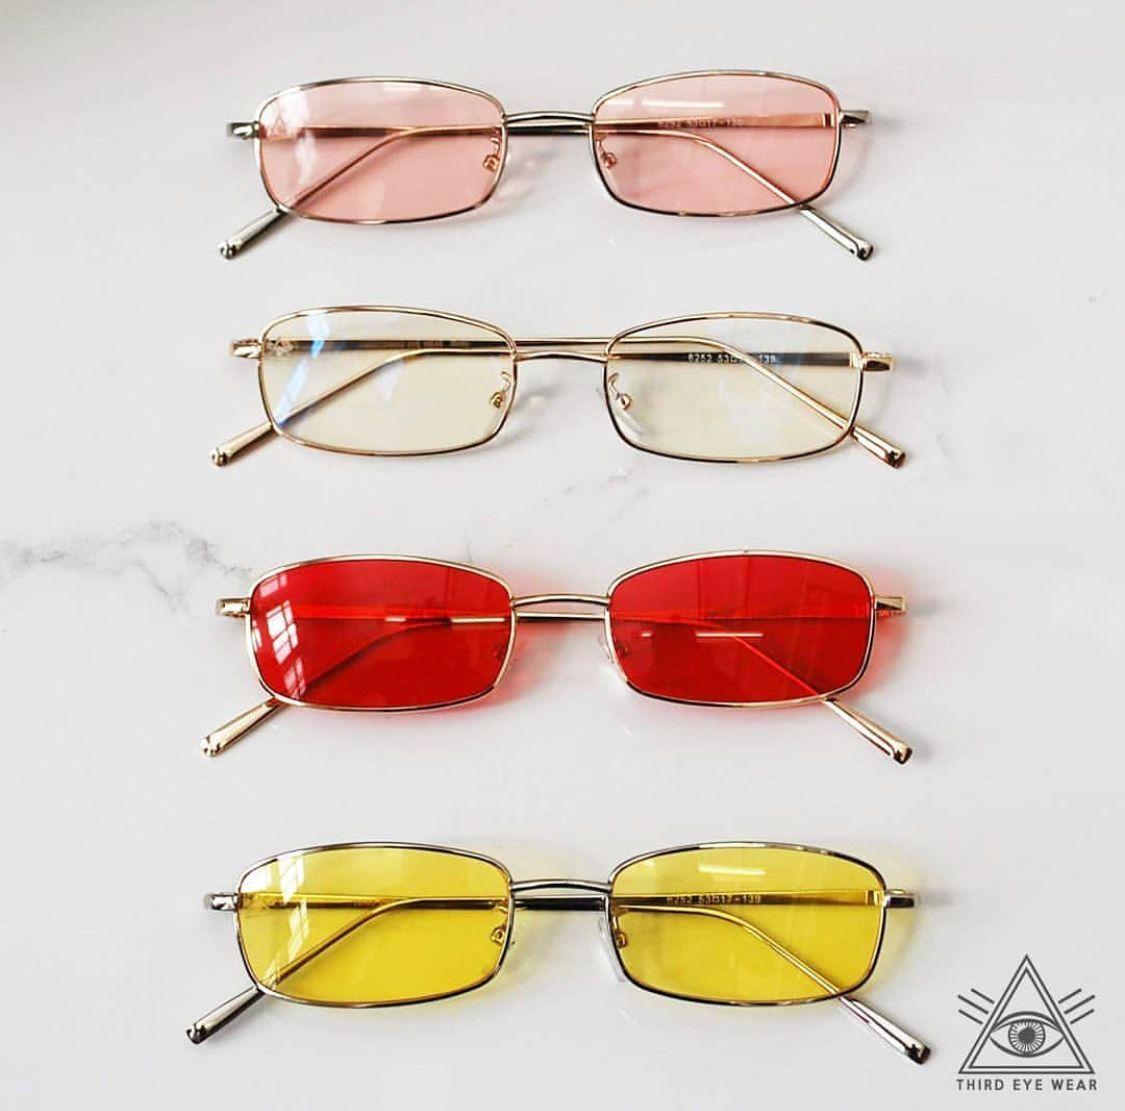 Sunglasses Square Sunglasses Mujer Sunglasses Illustration Celine Sunglasses Sunglasses Eyecat Dior Sunglasses Vintage Fashion Eye Glasses Glasses Accessories